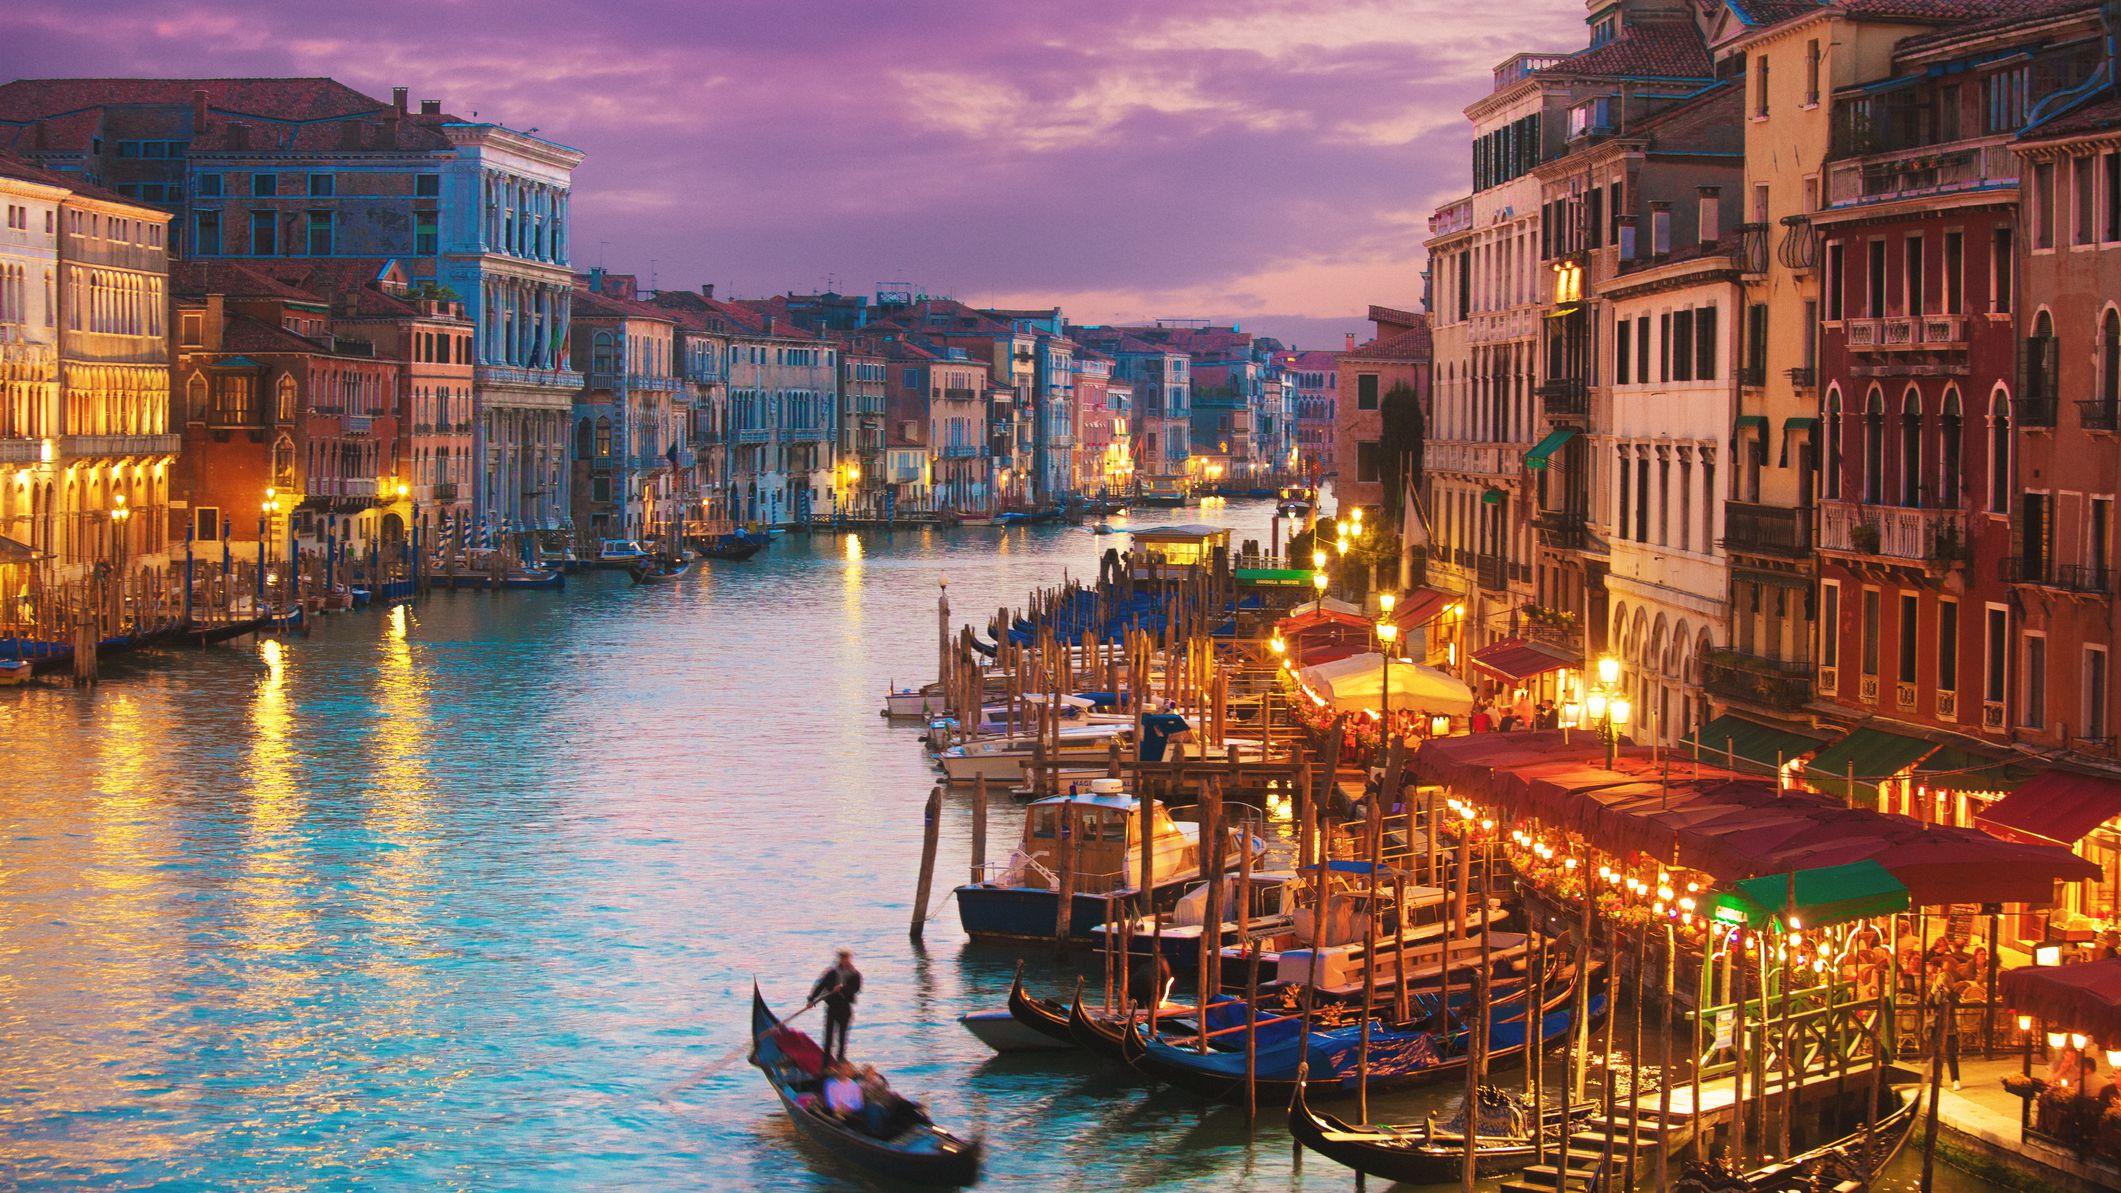 The 20 Best Venetian Gondola Rides of 20